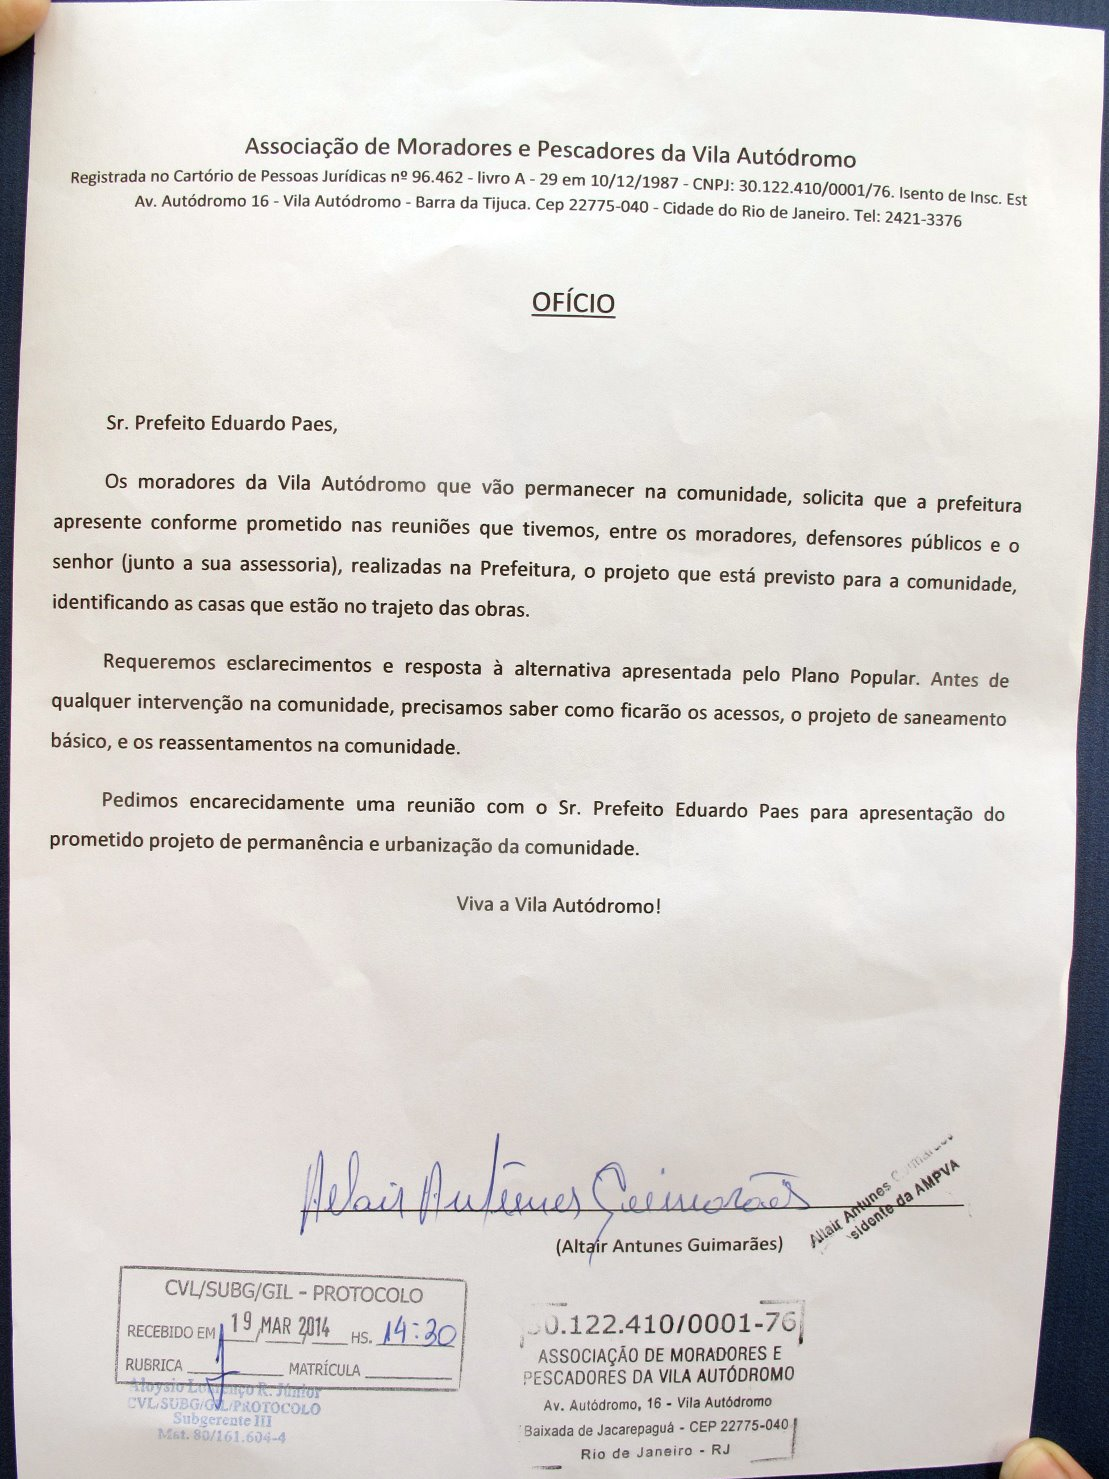 Nota to Prefeitura, Credit: Comitê Popular Rio